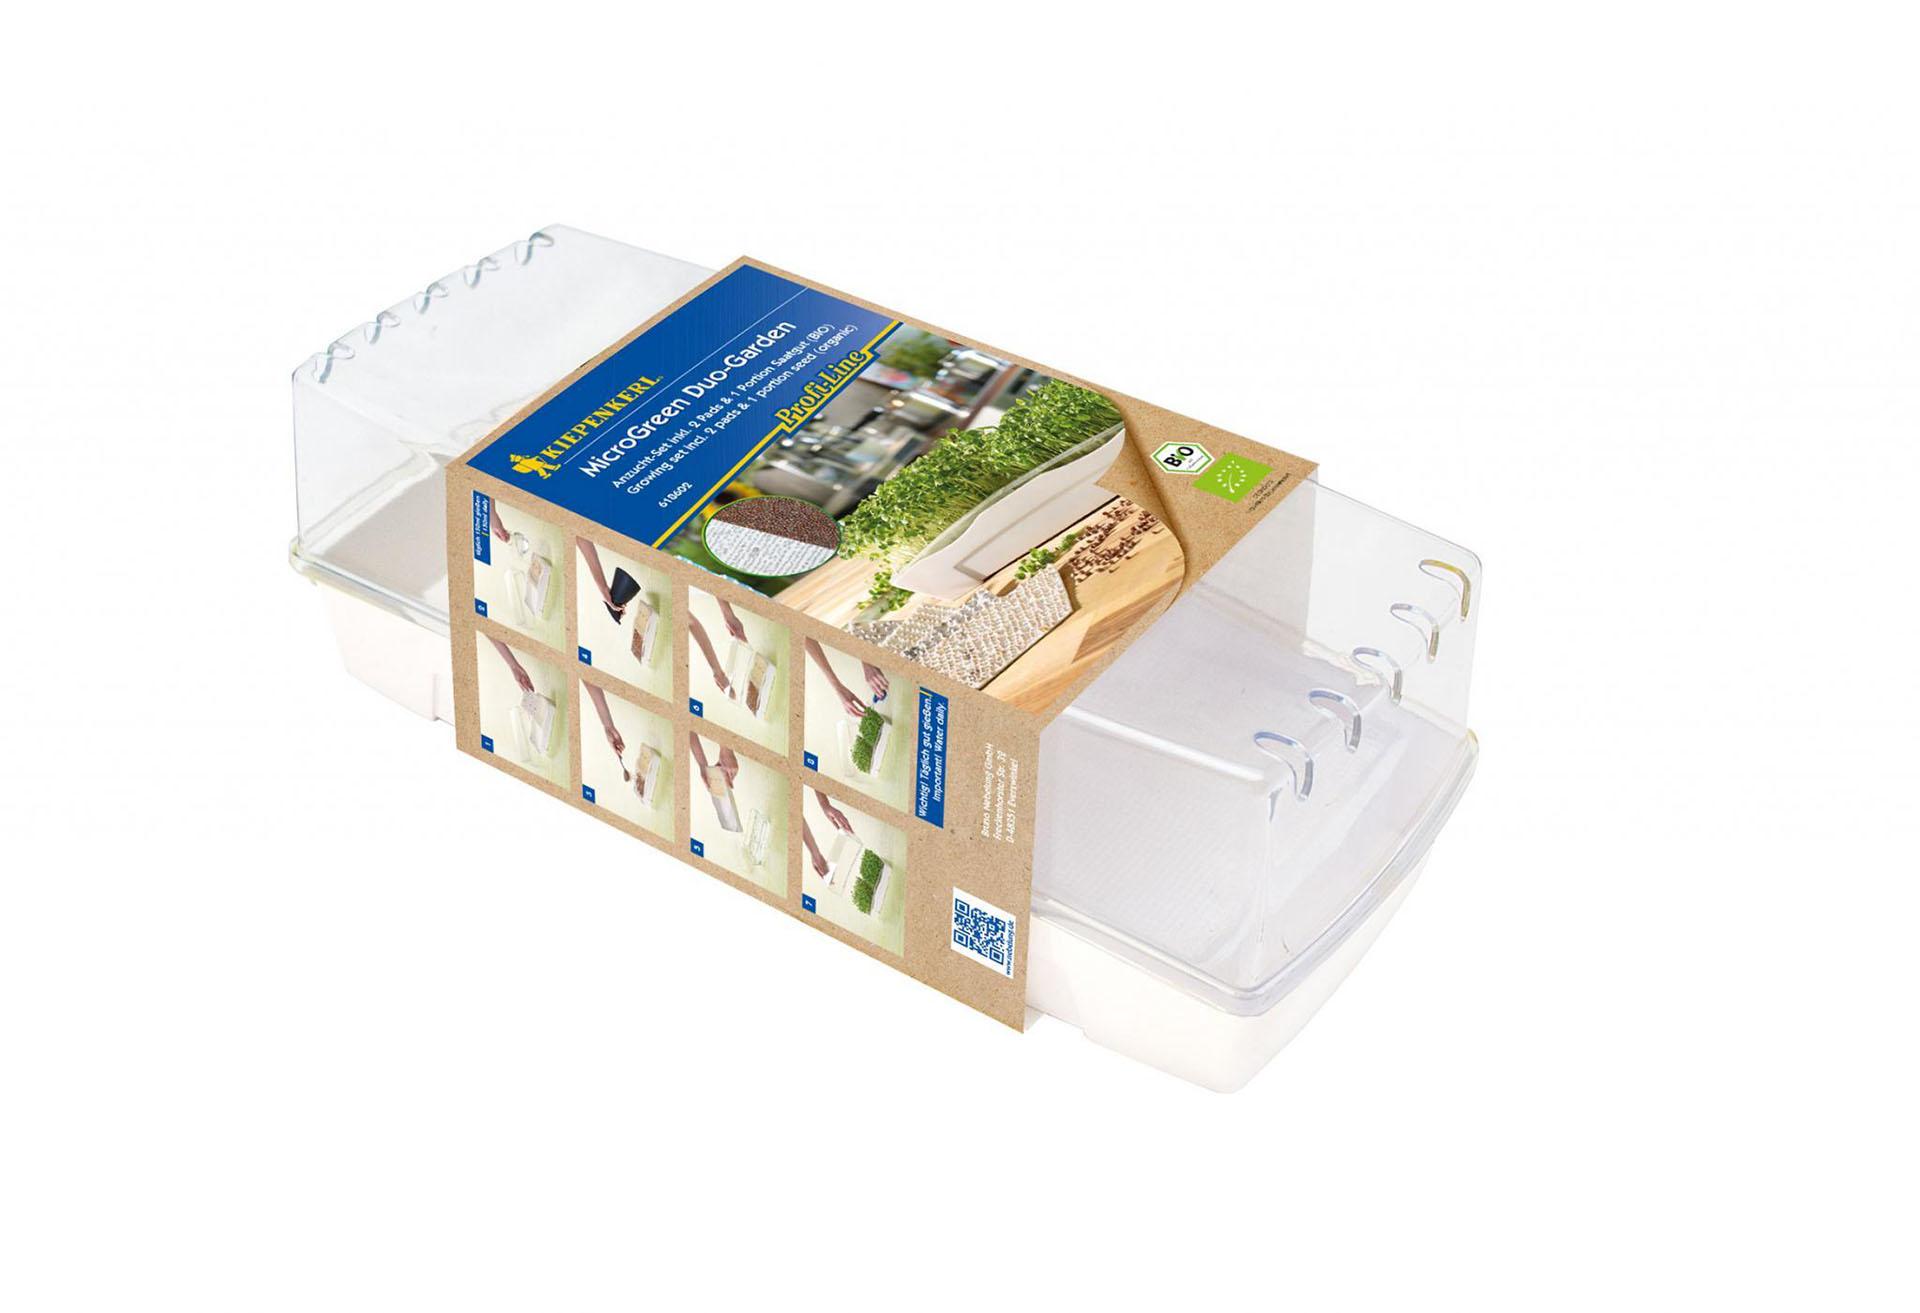 Kiepenkerl BIO-MicroGreen Duo-Garden, Set